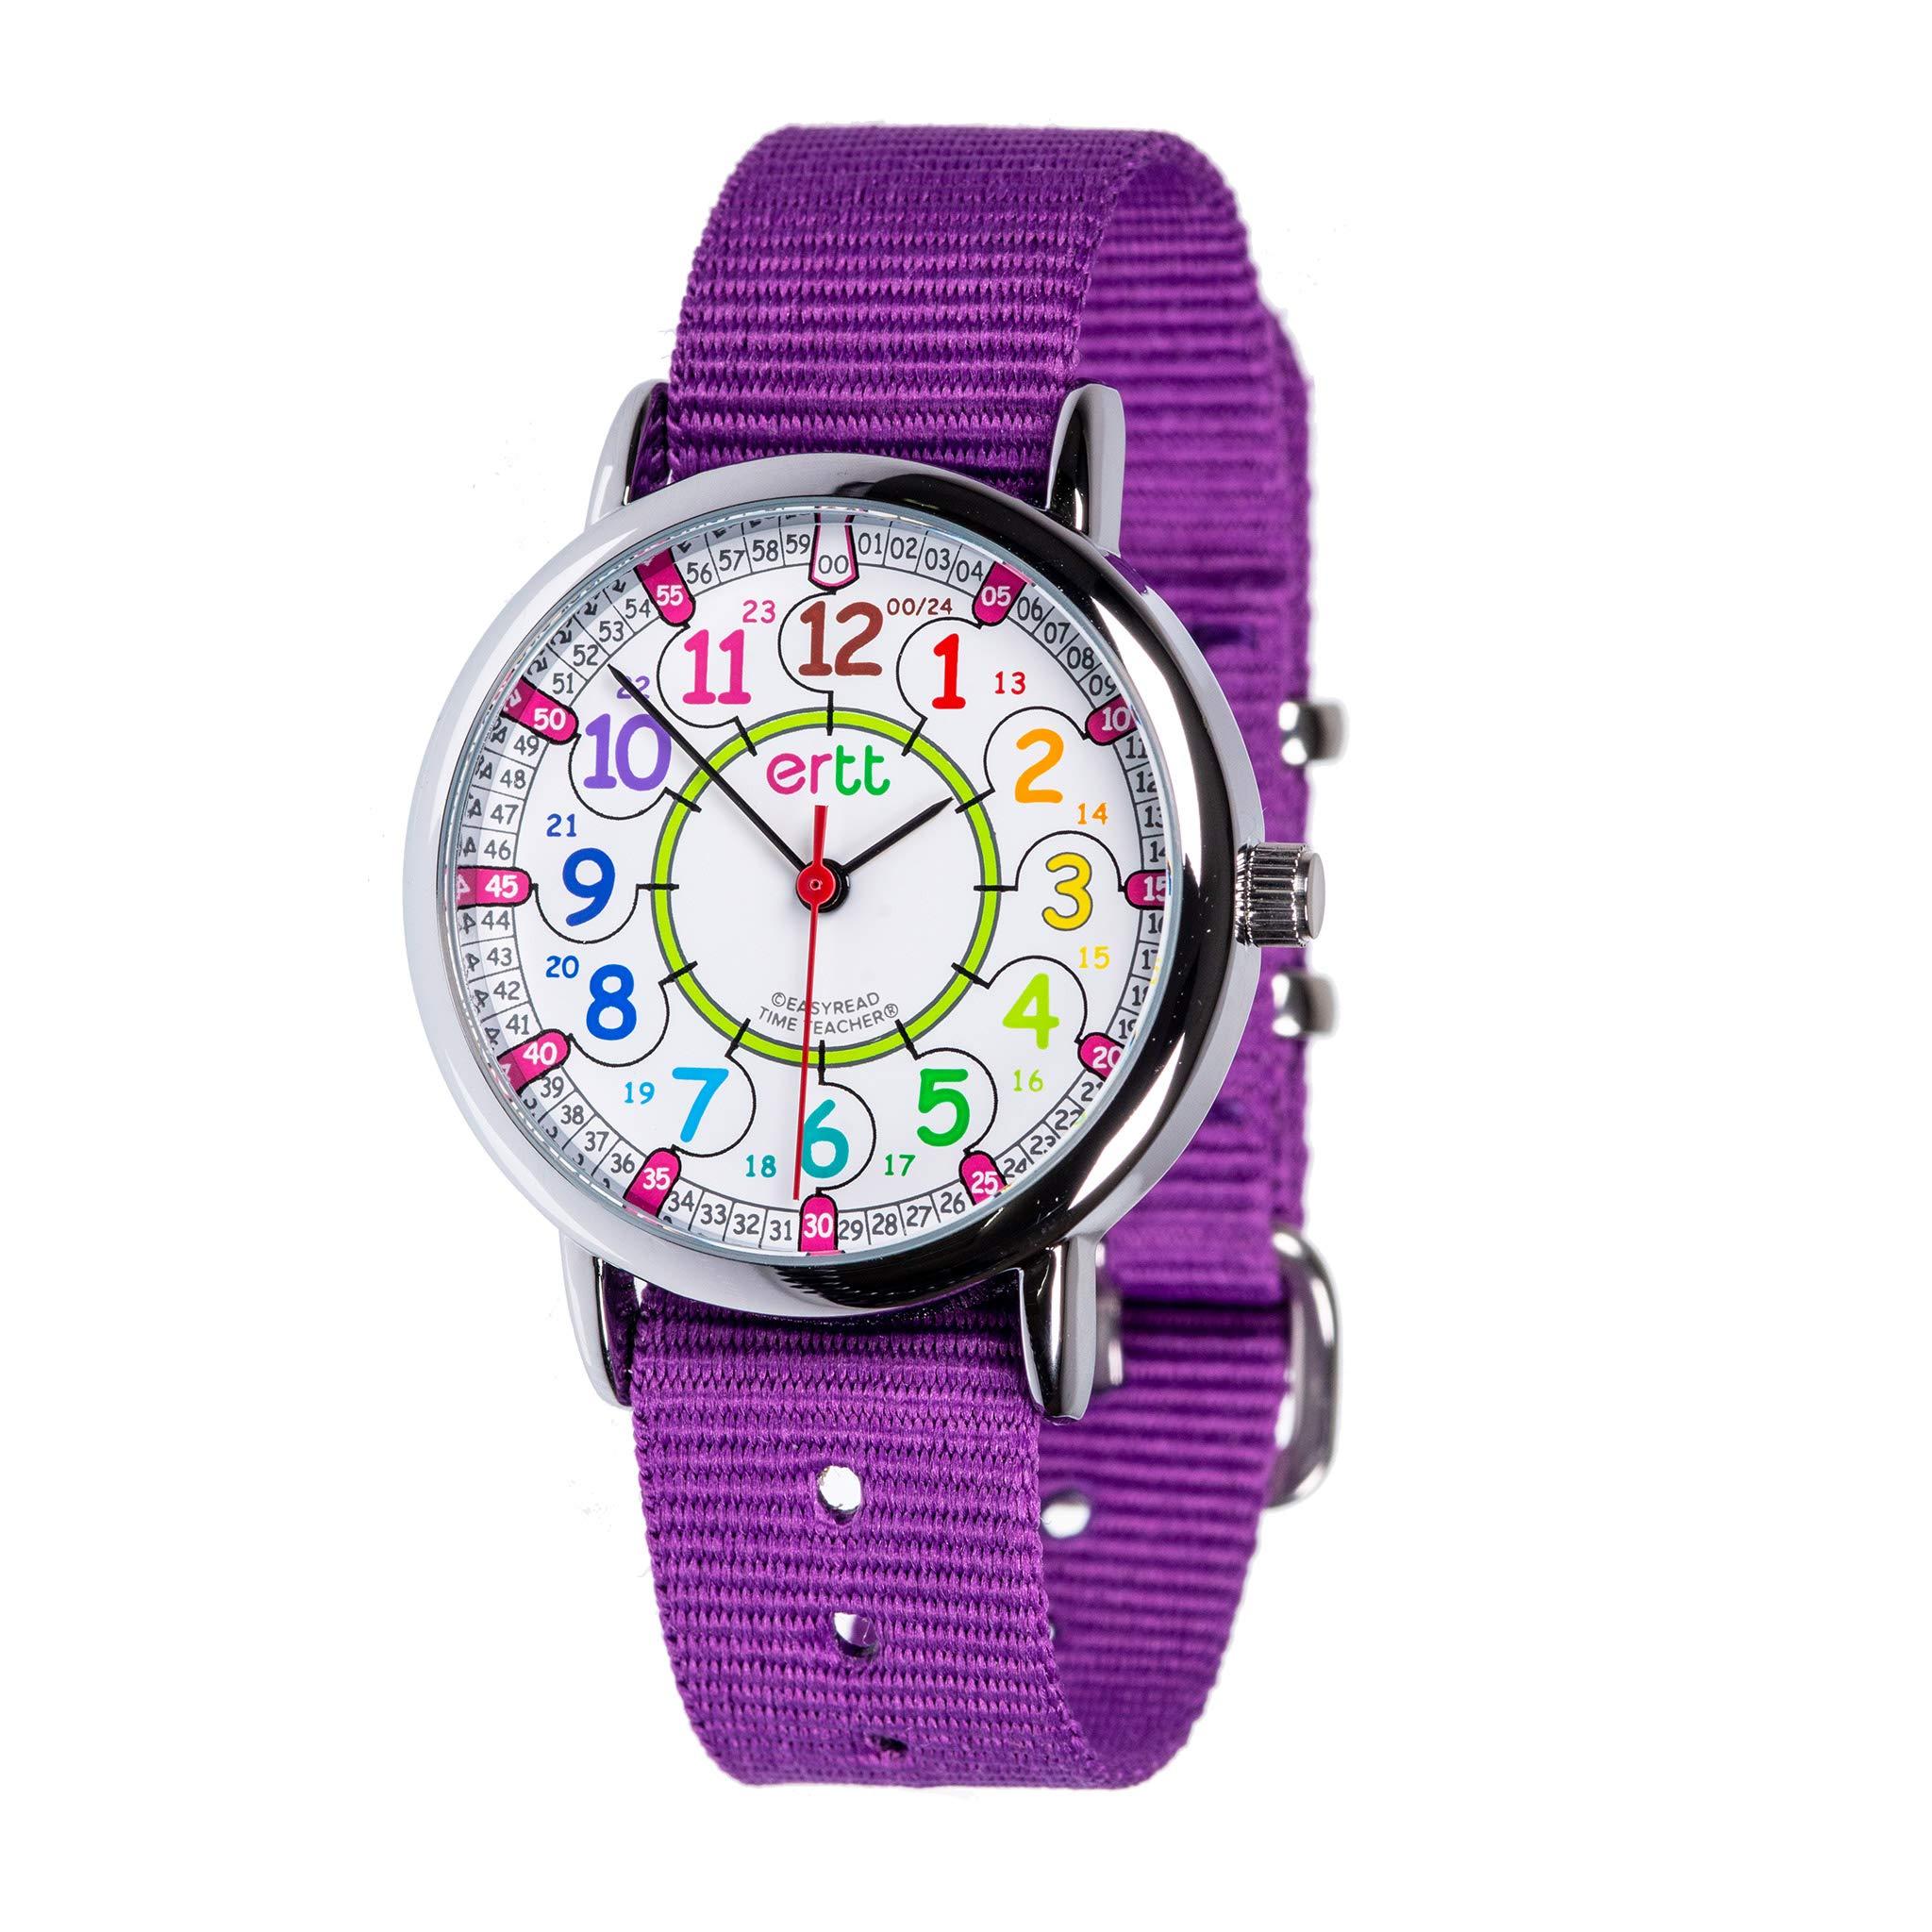 EasyRead Time Teacher Children's Watch, Rainbow 12/24 Hour Face, Purple Strap by EasyRead Time Teacher